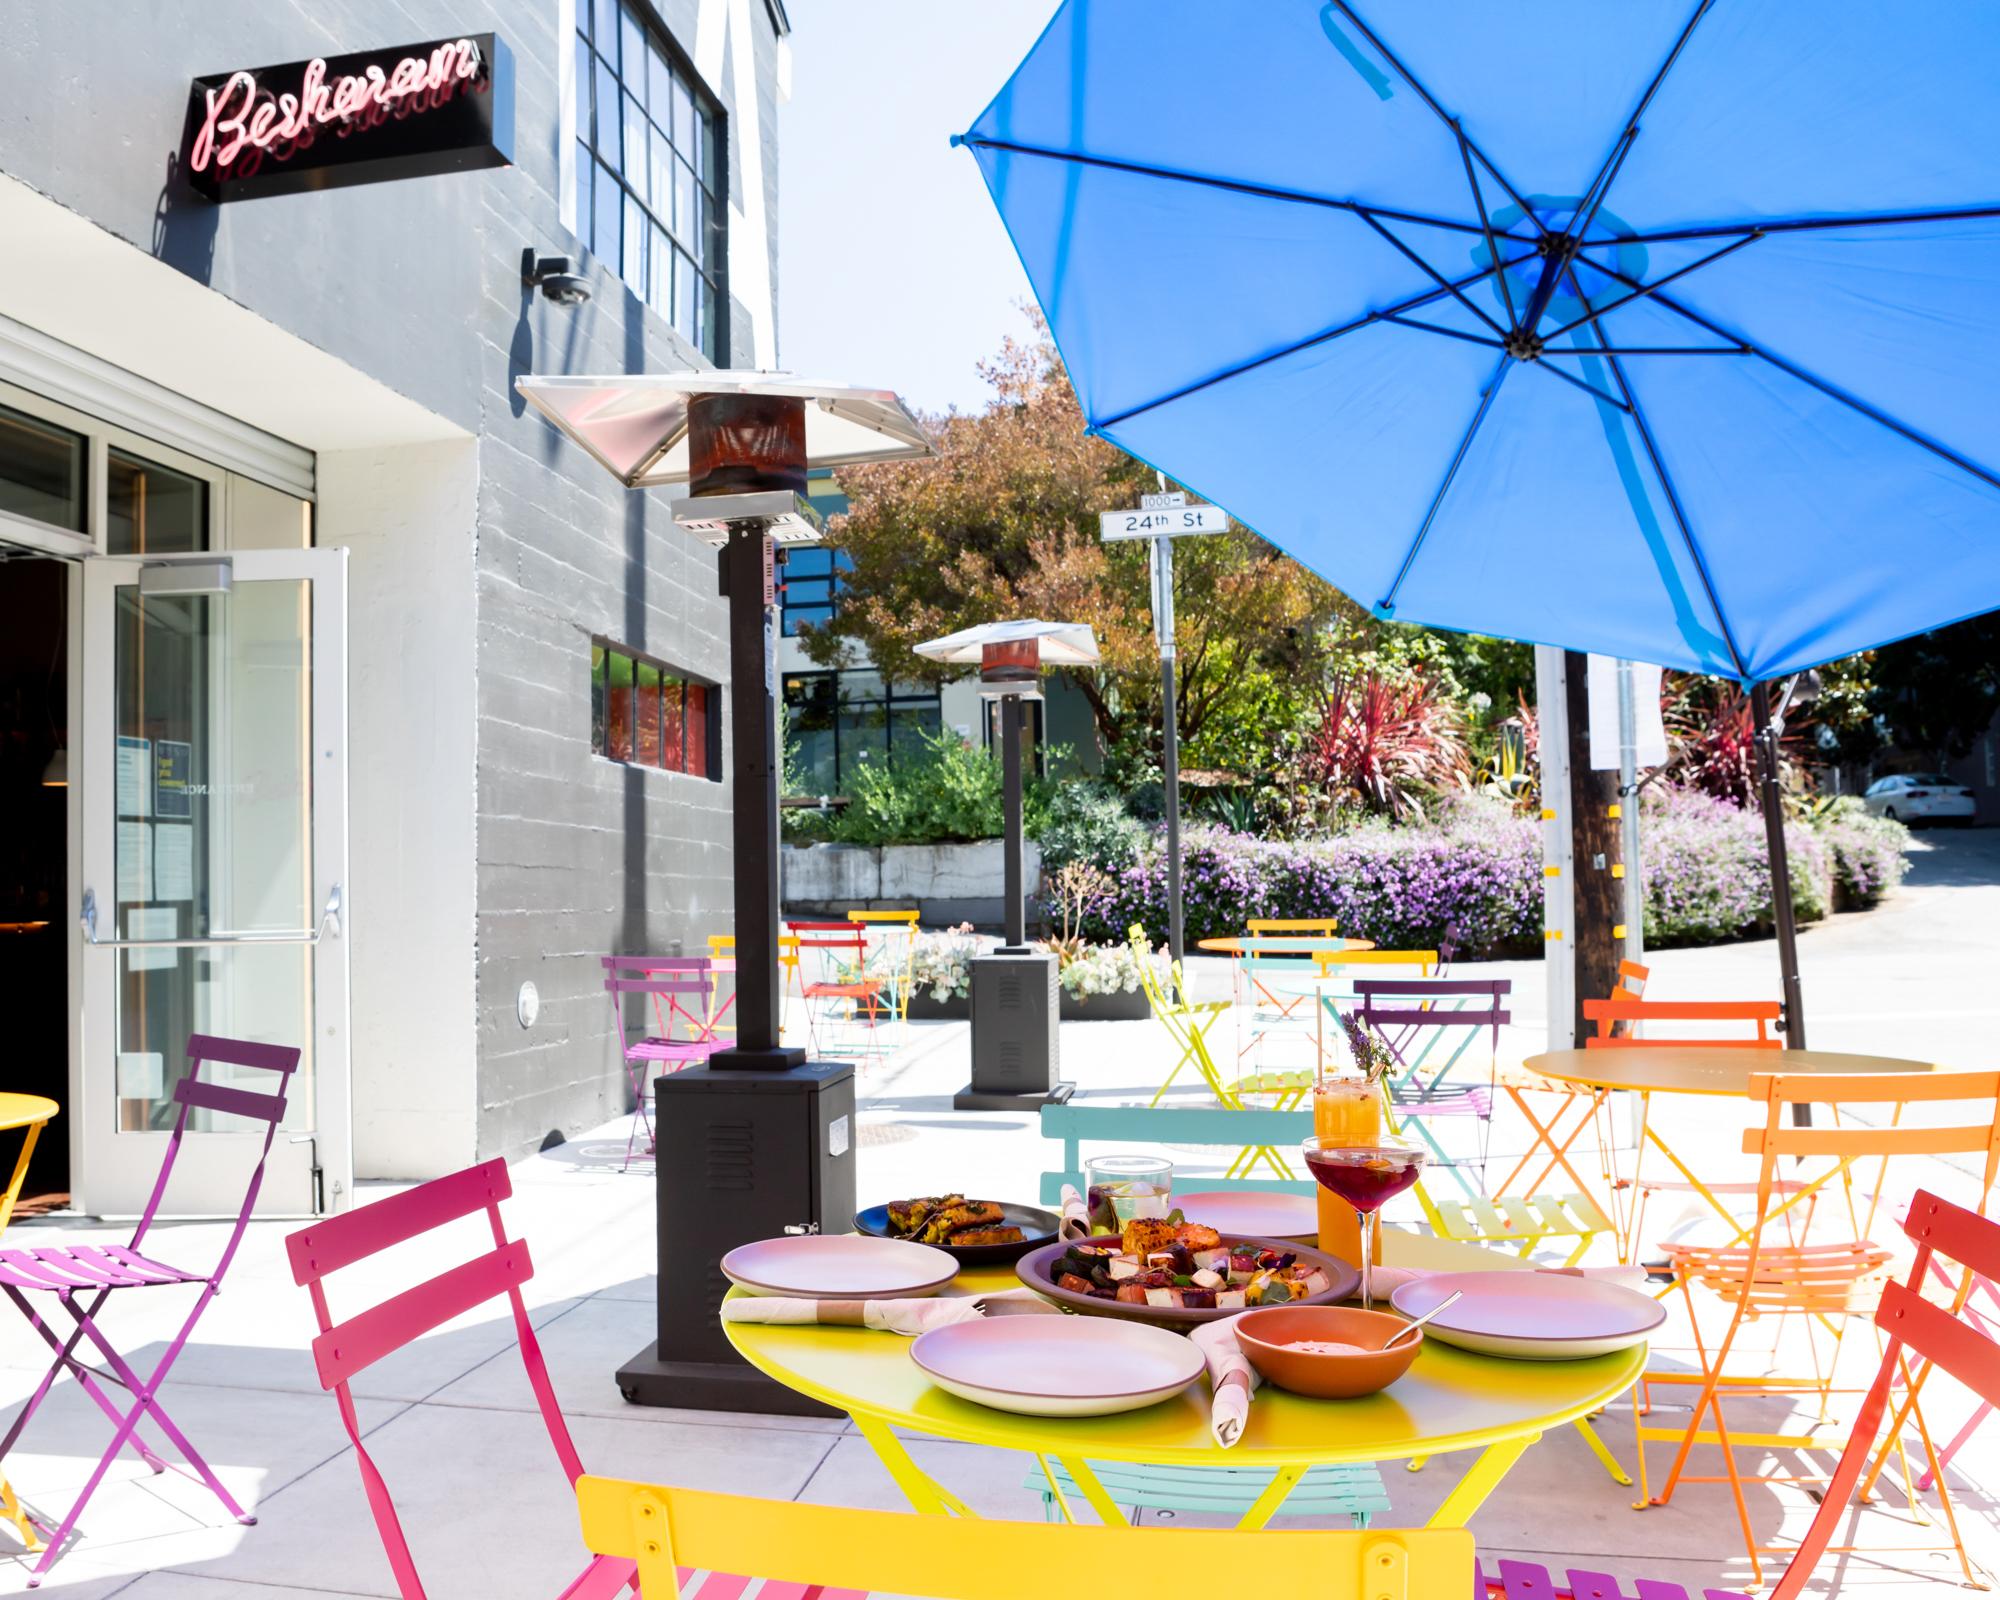 Sidewalk dining at Besharam